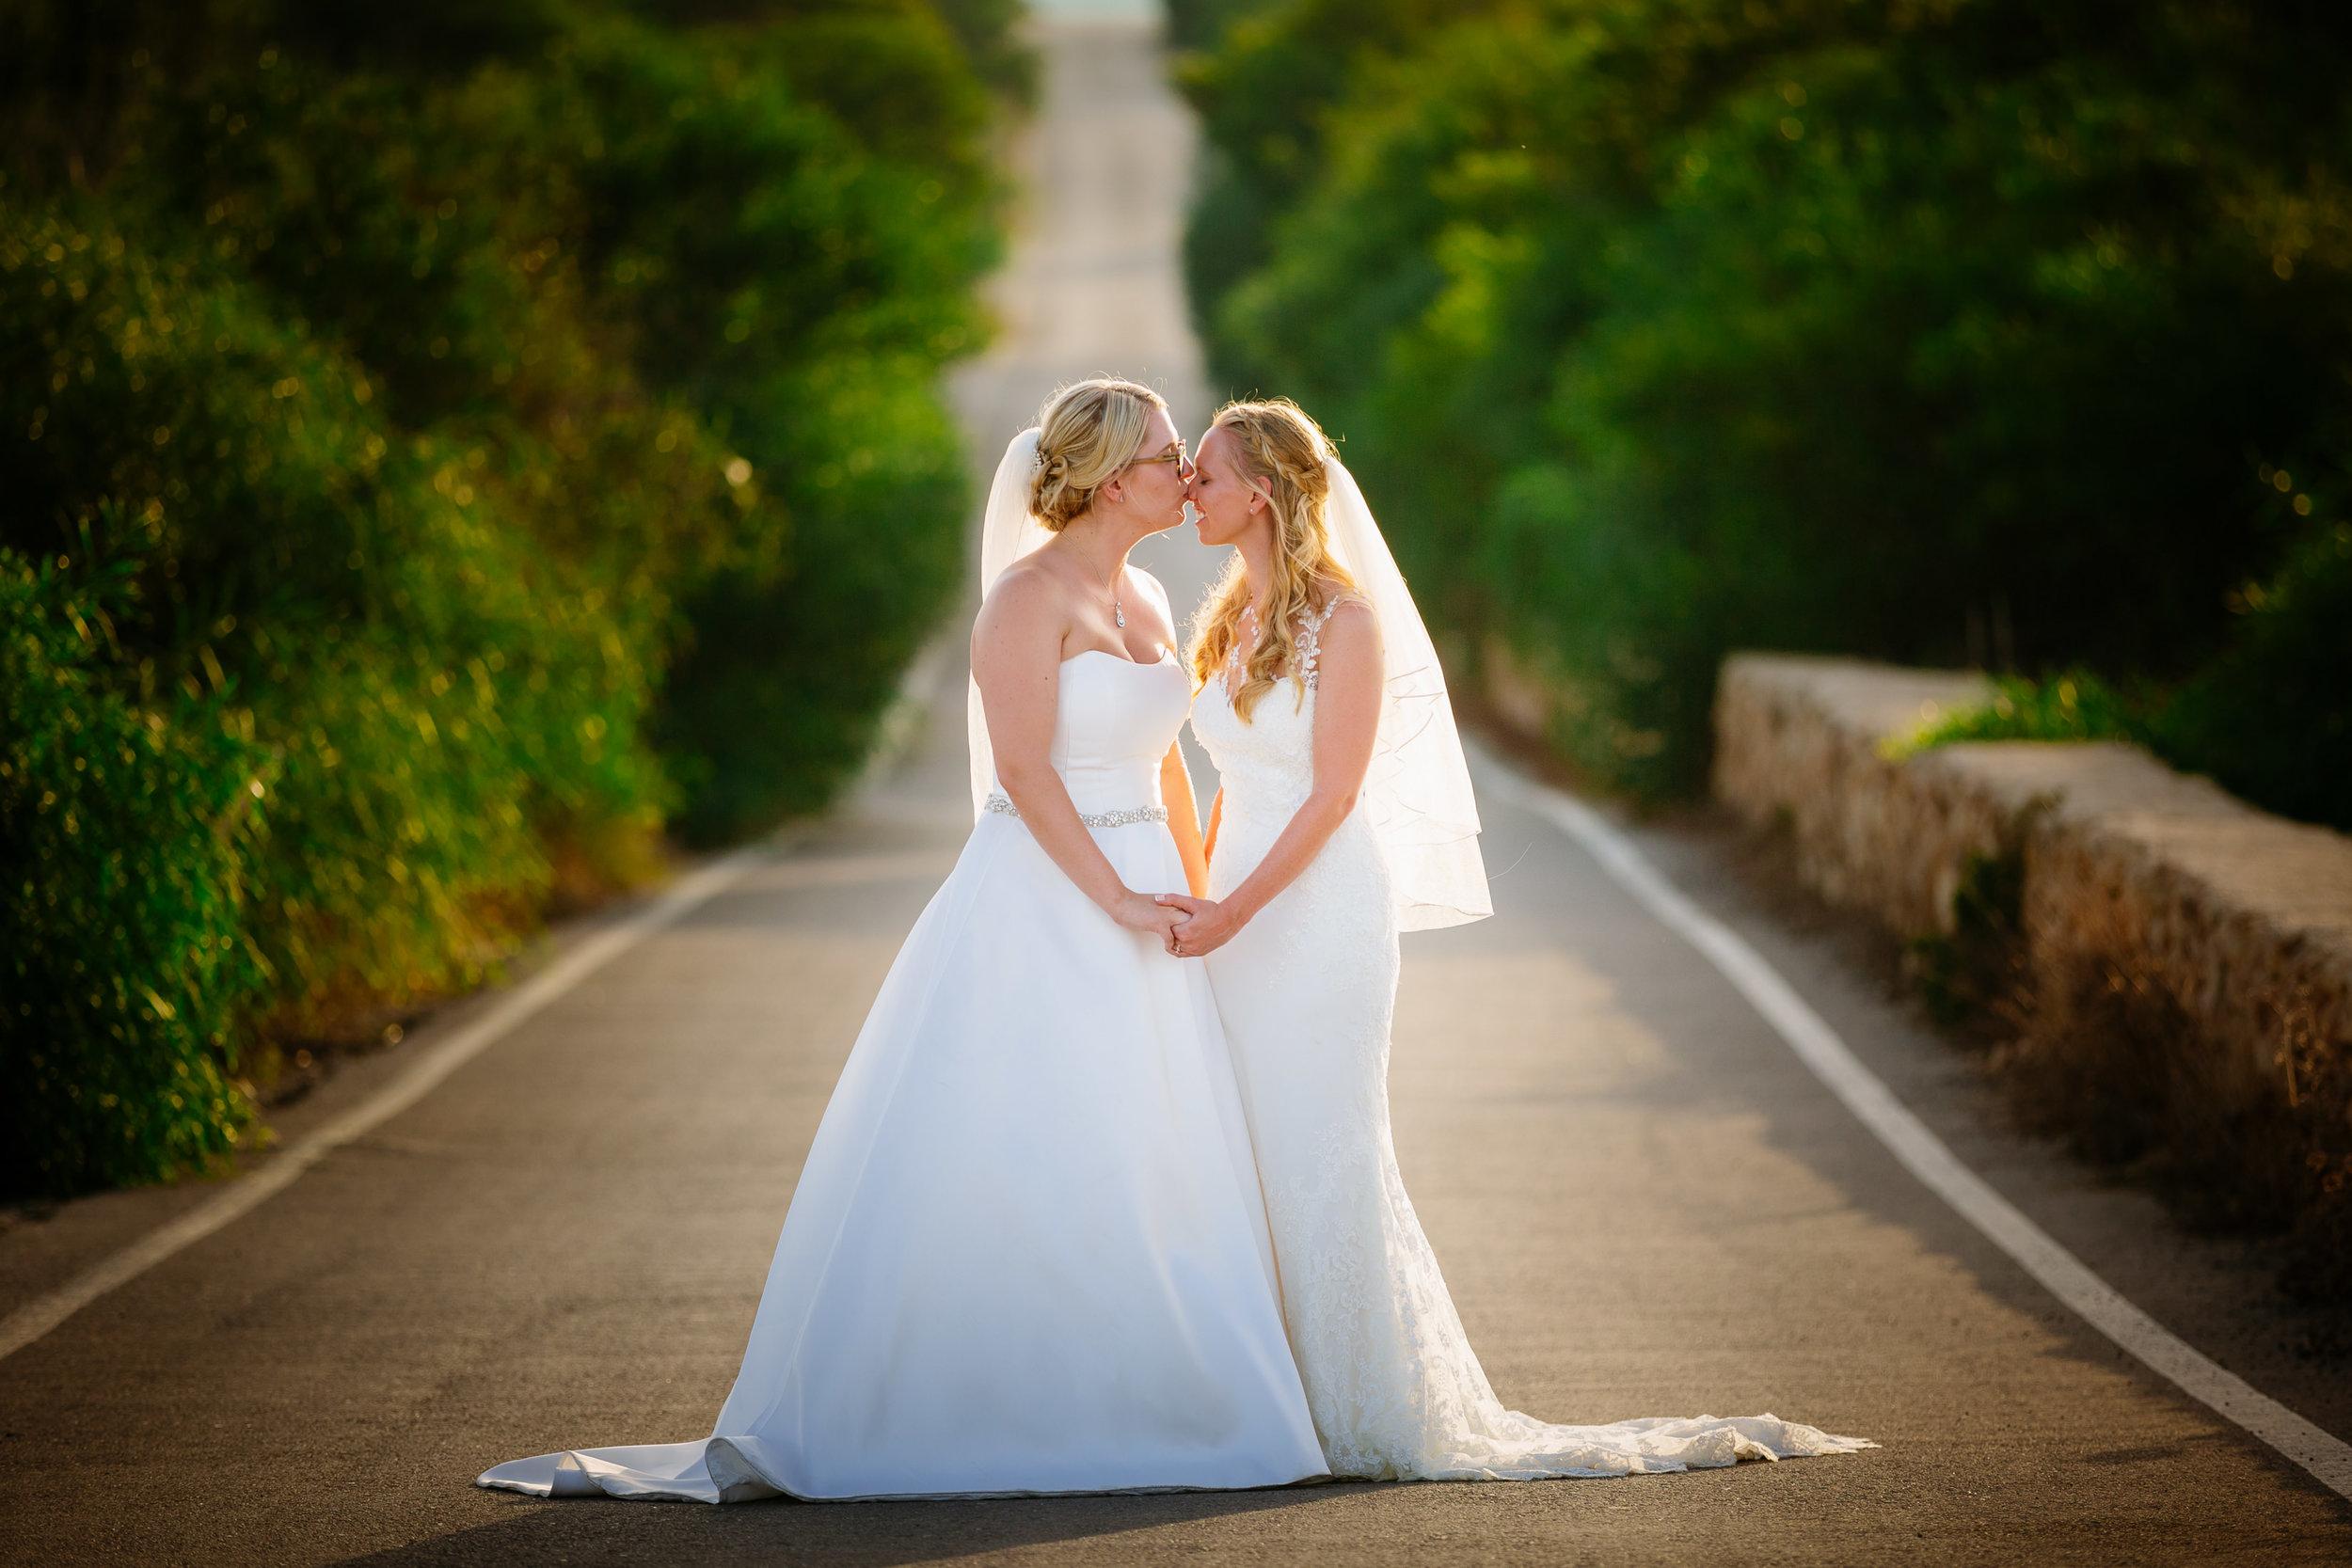 Malta_wedding_photography-85.jpg